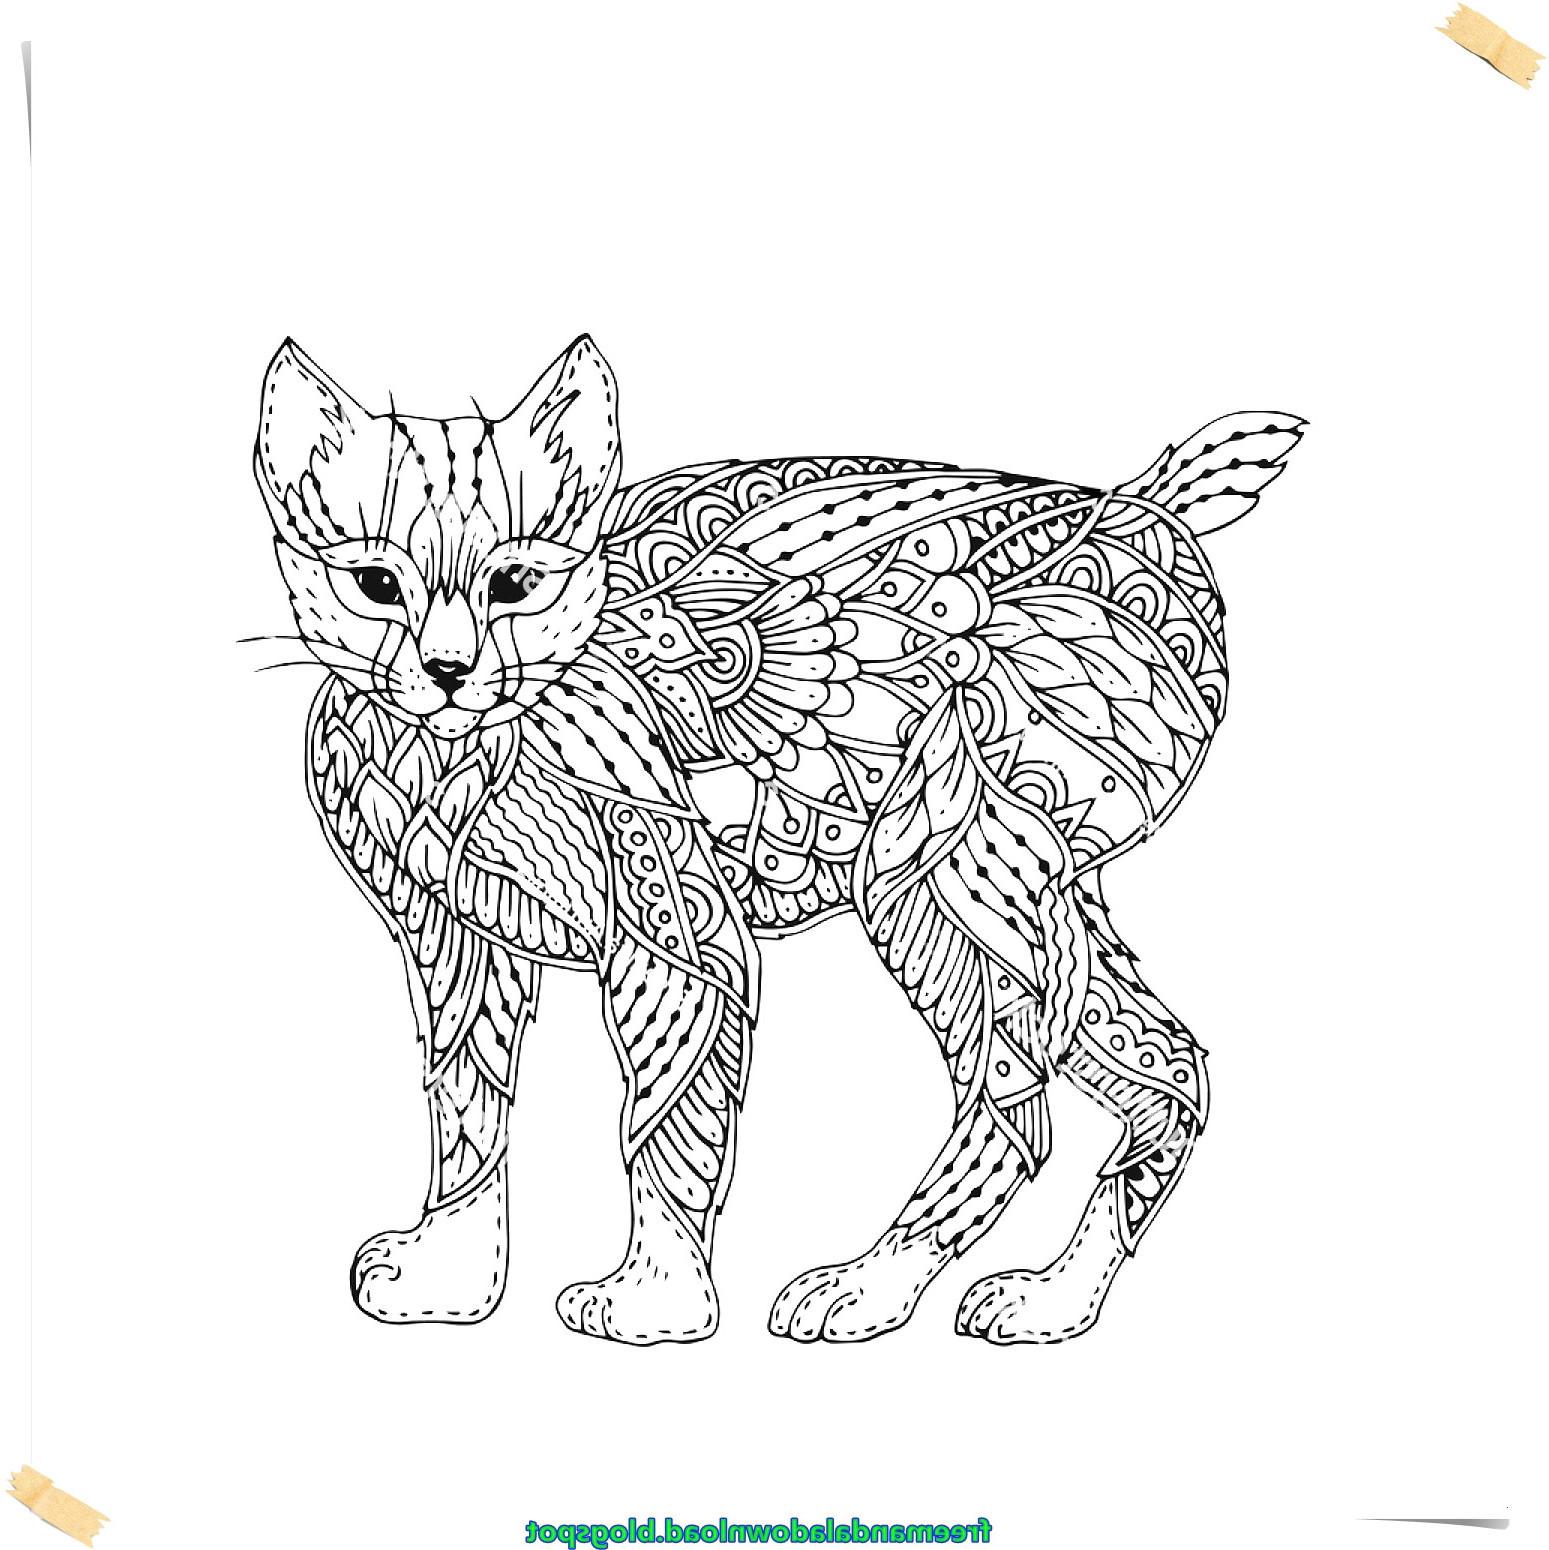 Katzen Bilder Zum Ausmalen Inspirierend 27 Neu Katzen Ausmalbilder – Malvorlagen Ideen Fotos